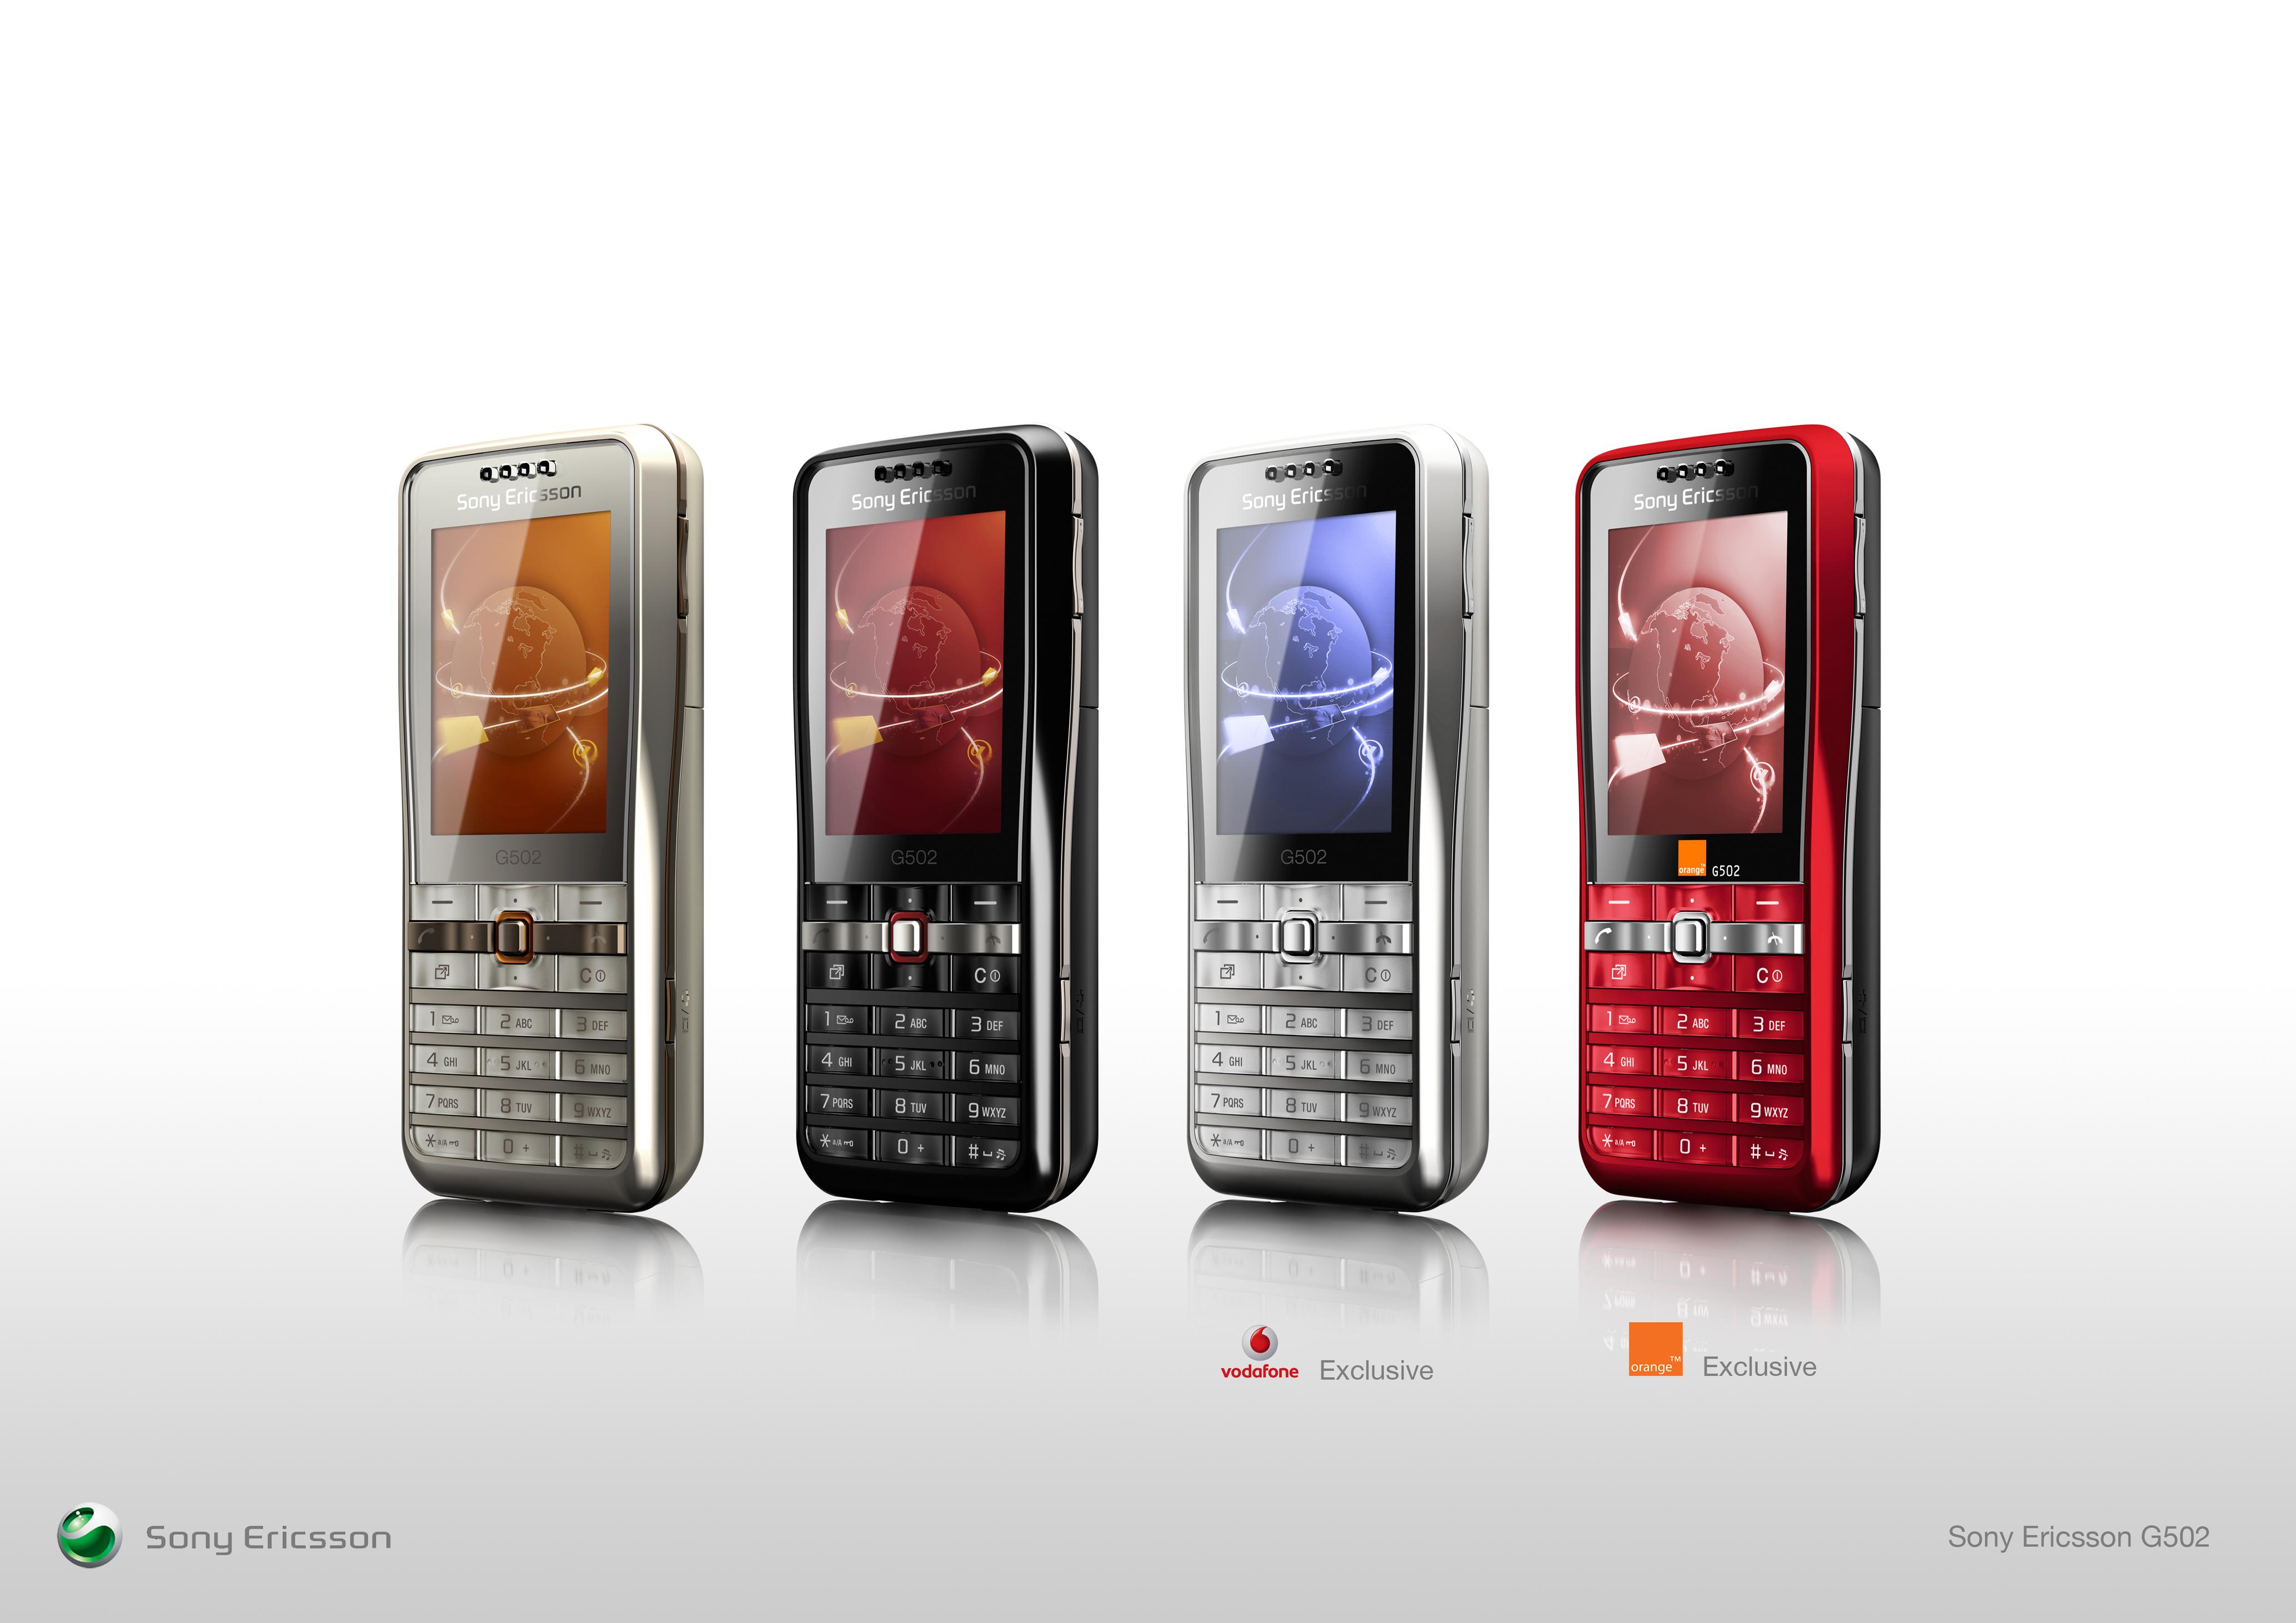 Sony Ericsson G502 by Dave Lim at Coroflot.com